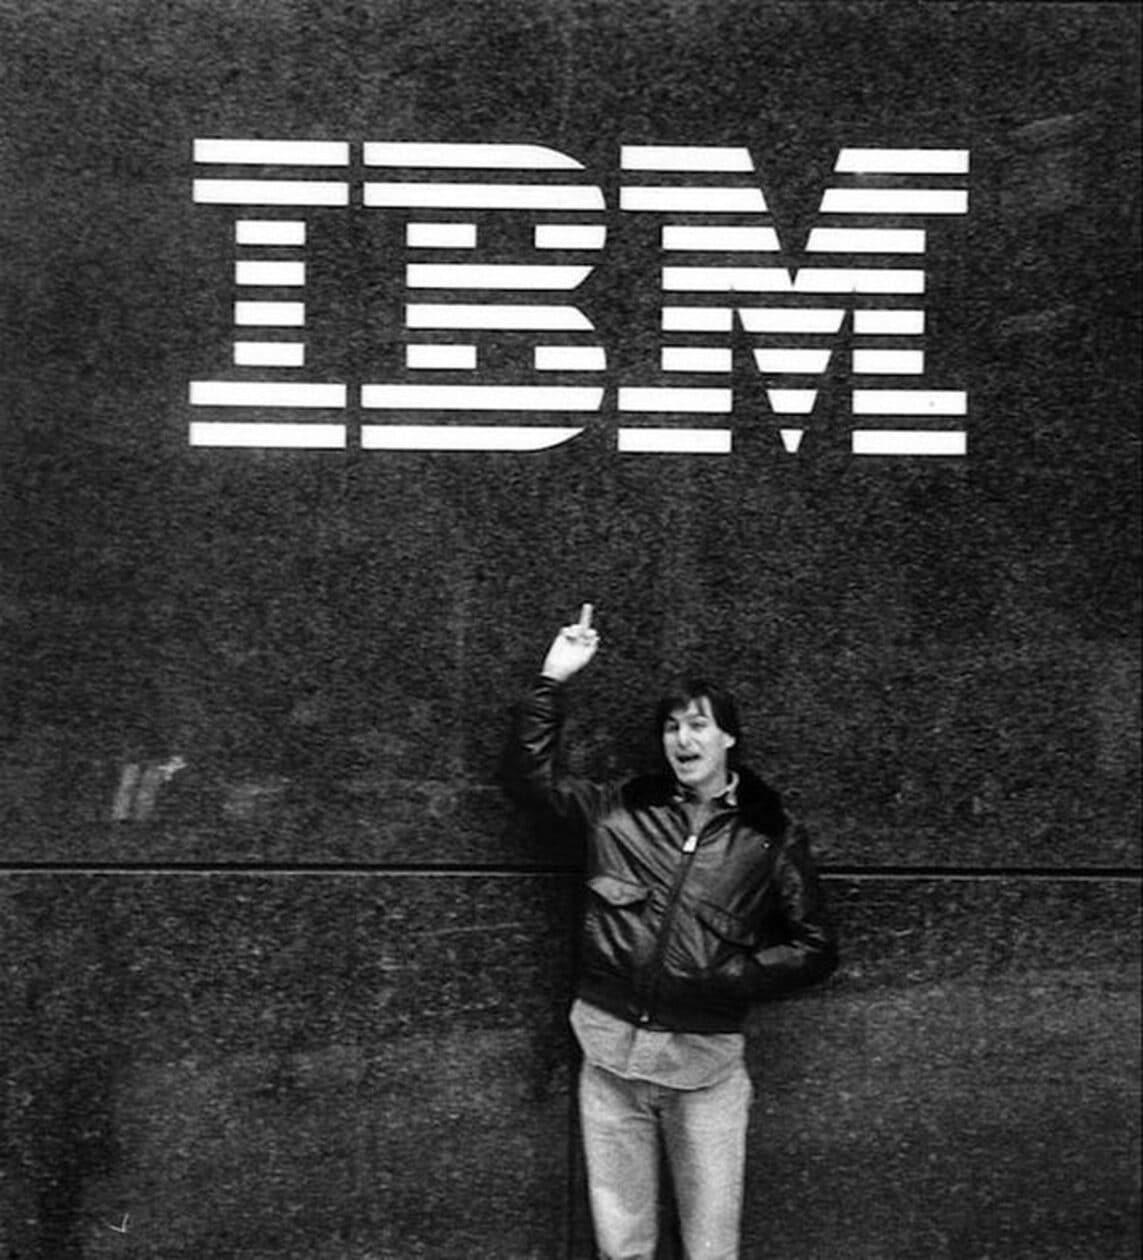 Steve Jobs le da el dedo a IBM